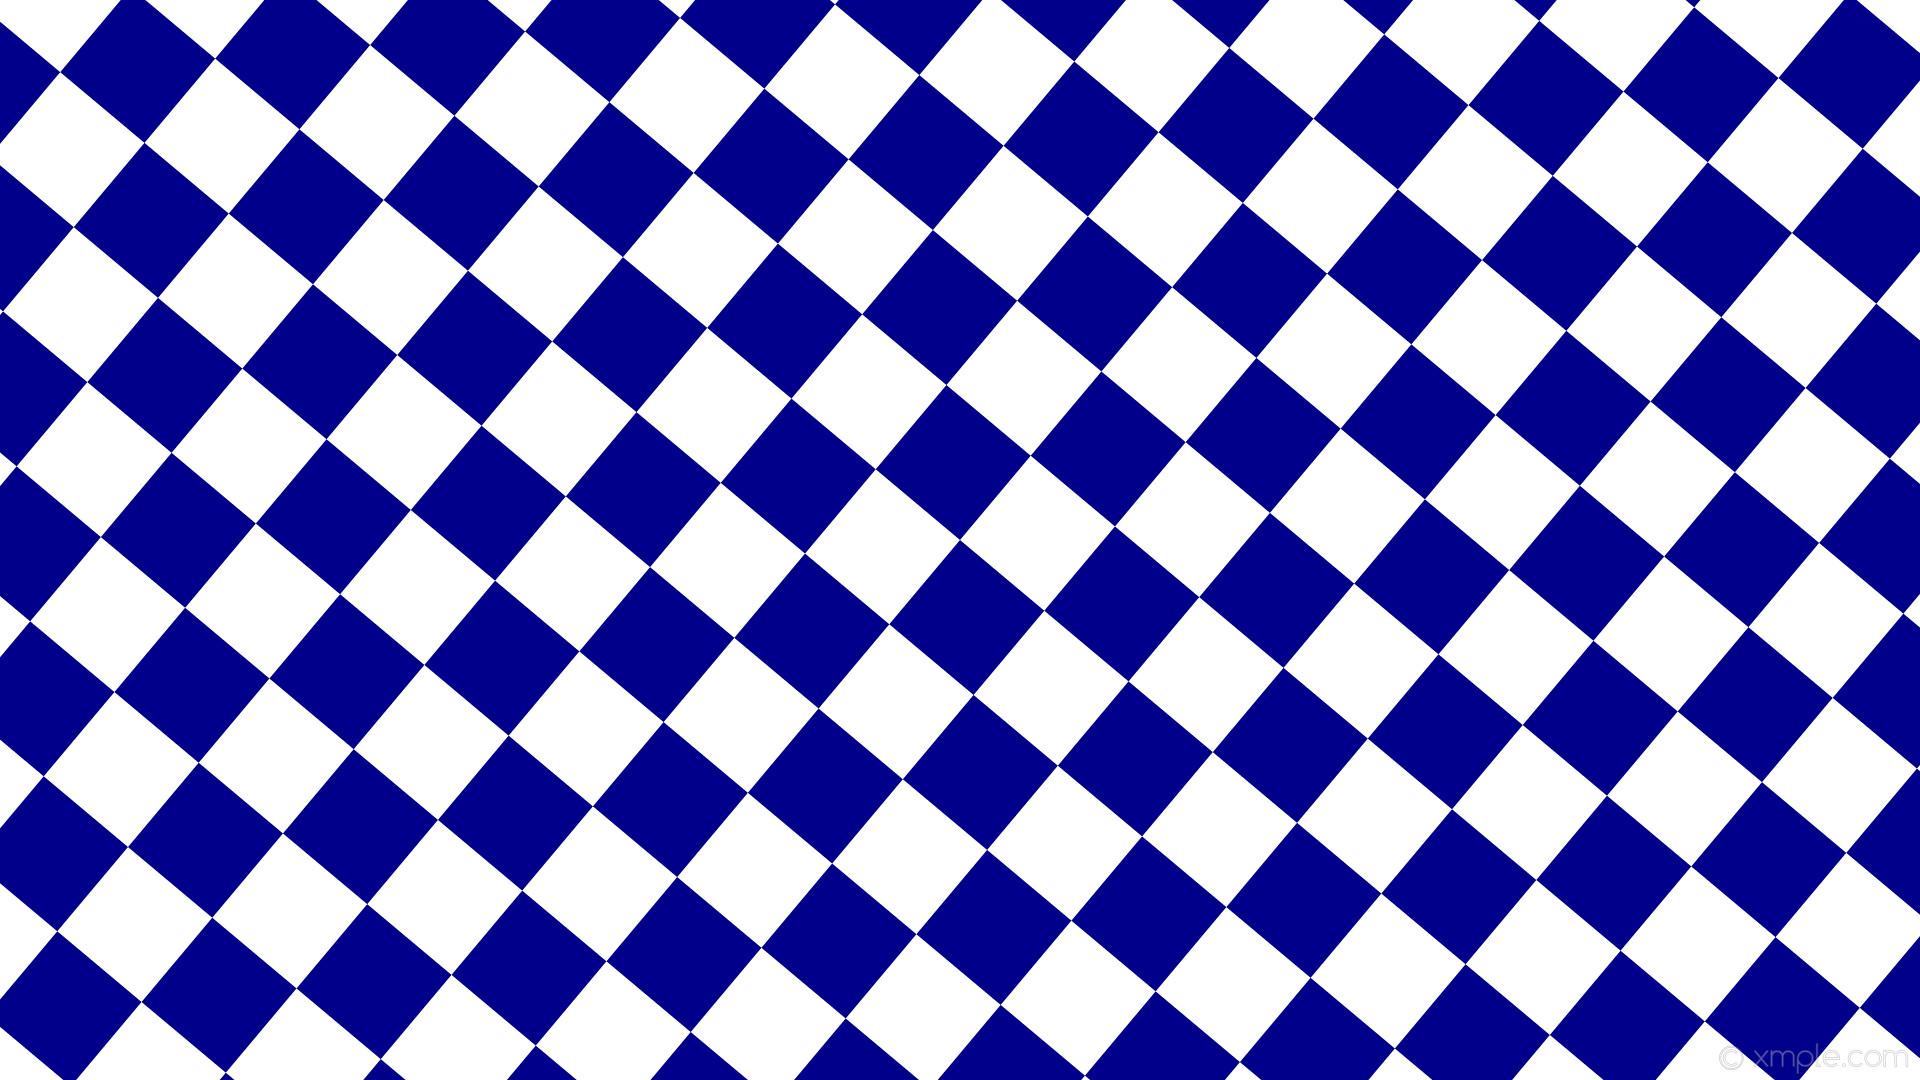 wallpaper checkered blue white squares dark blue #ffffff #00008b diagonal  50° 110px